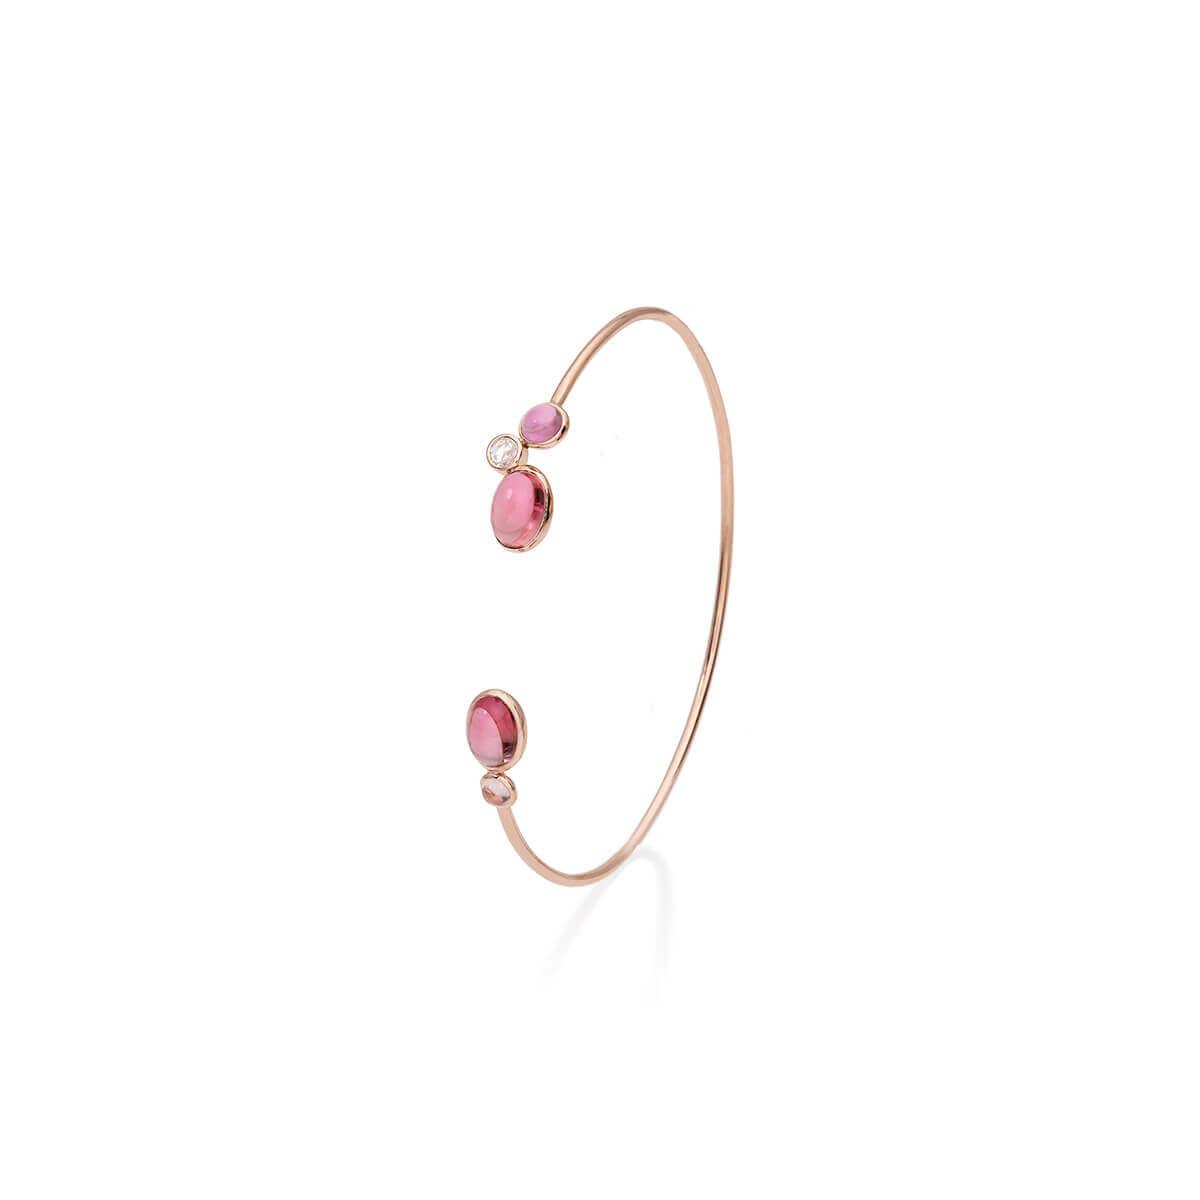 morethanthis-fine-jewelry-myrto-anastasopoulou-dreamer-BRC009